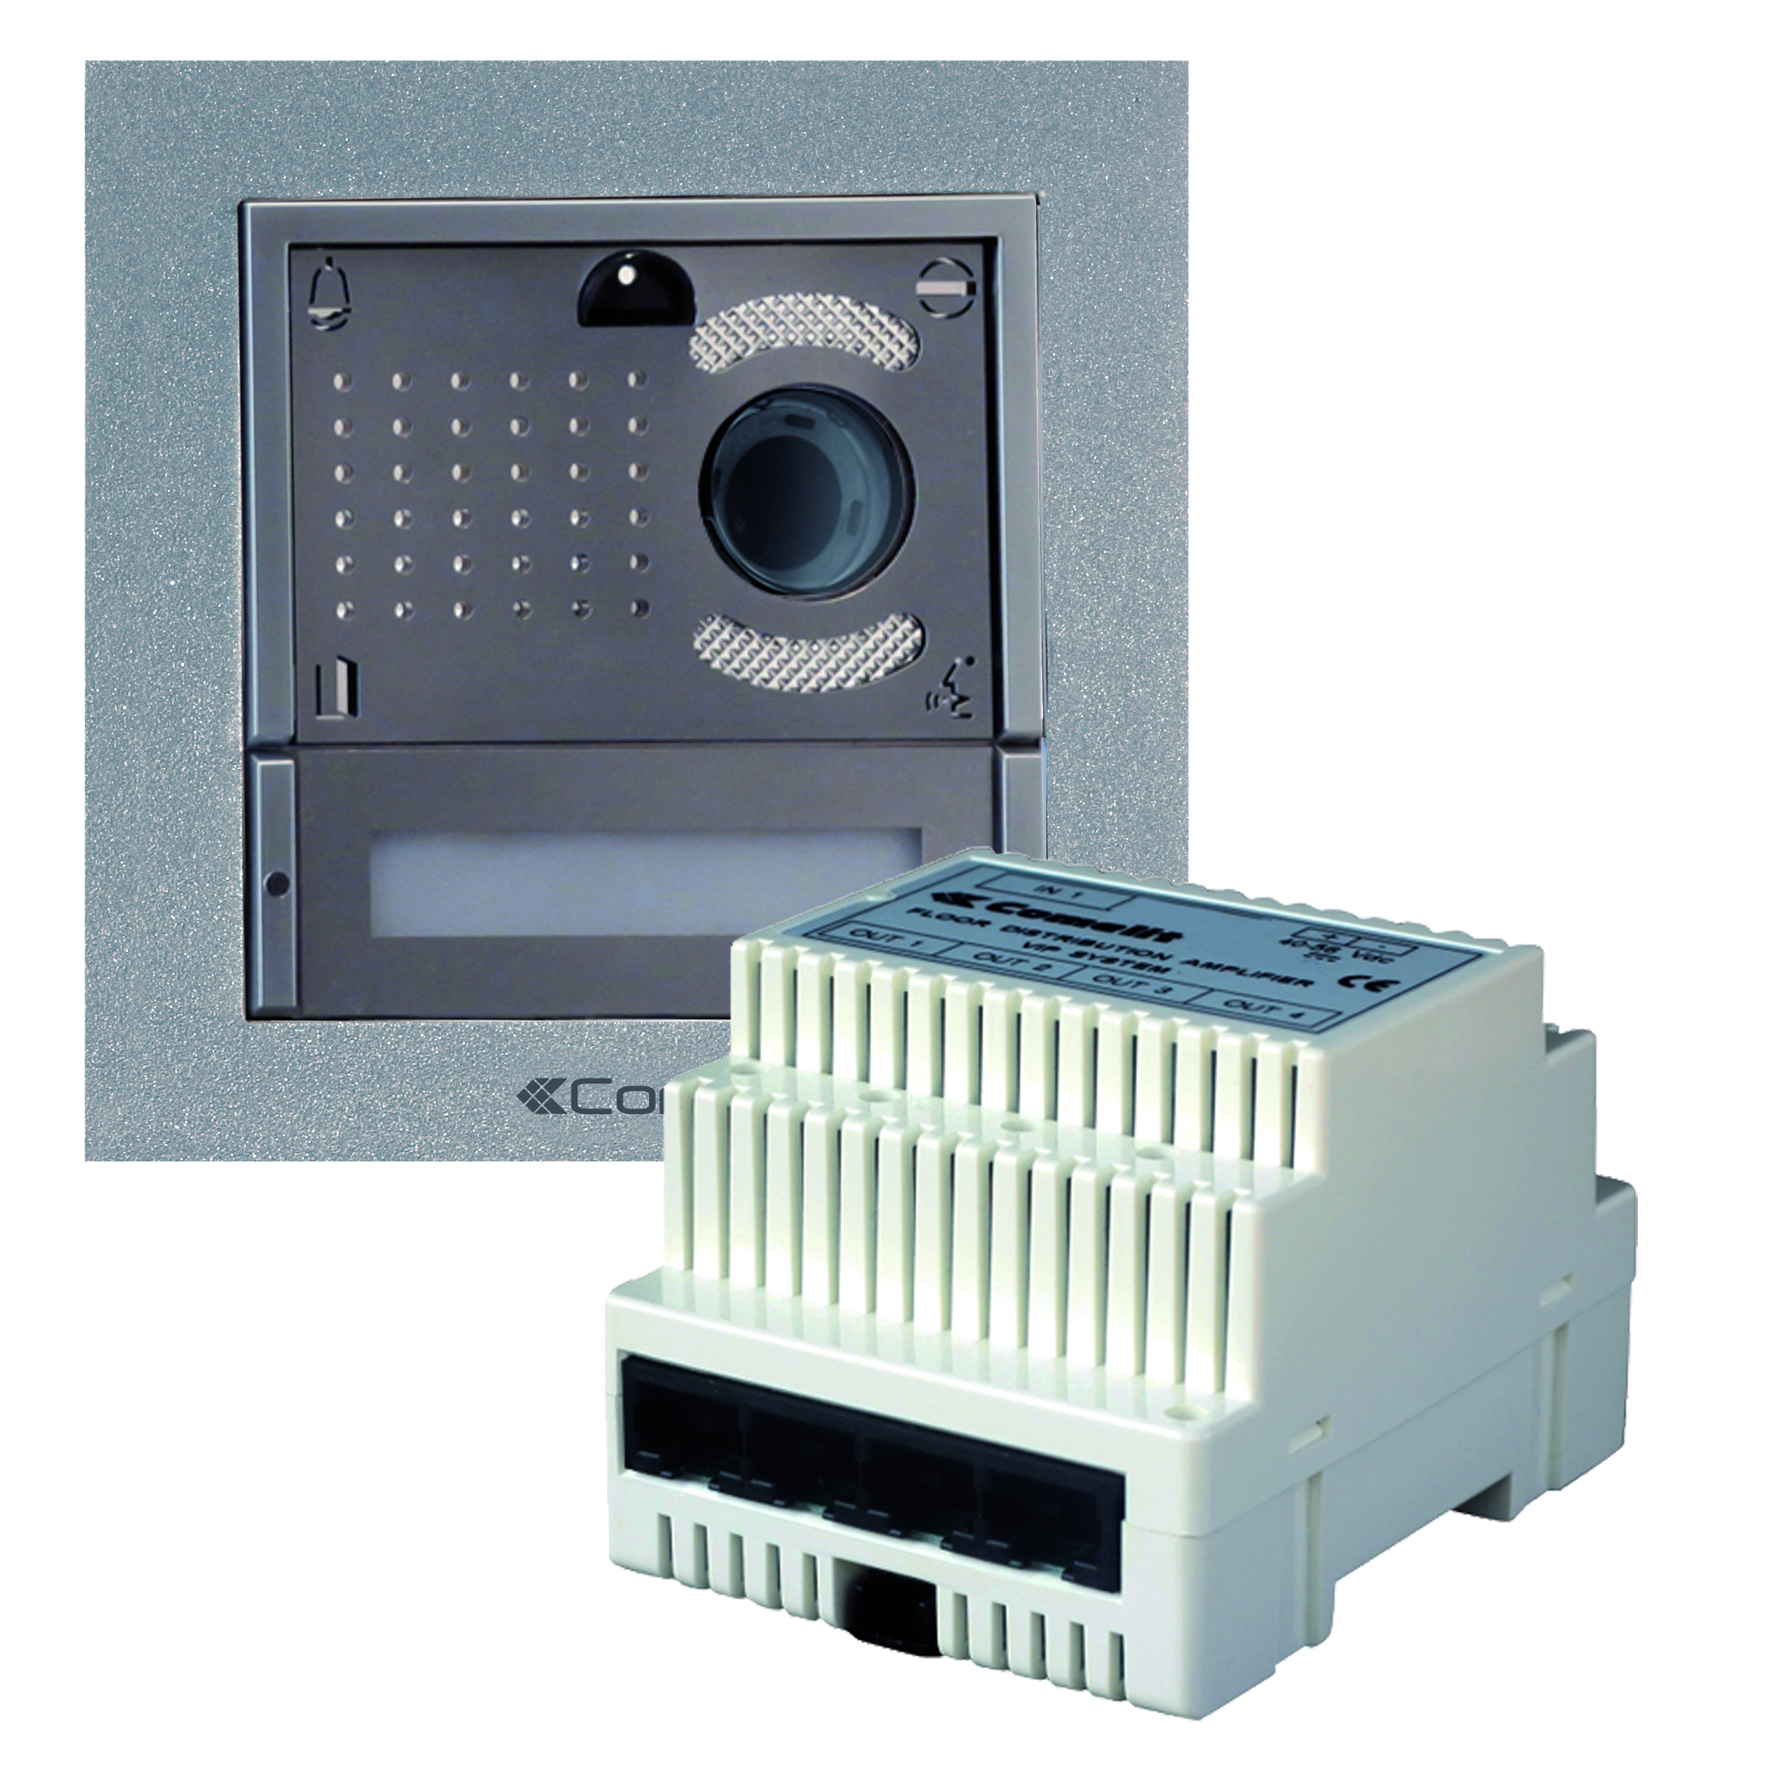 1 Stk Einfamilien-Videokit IKALL METAL mit Master Gateway, VIP SP8513HIM-